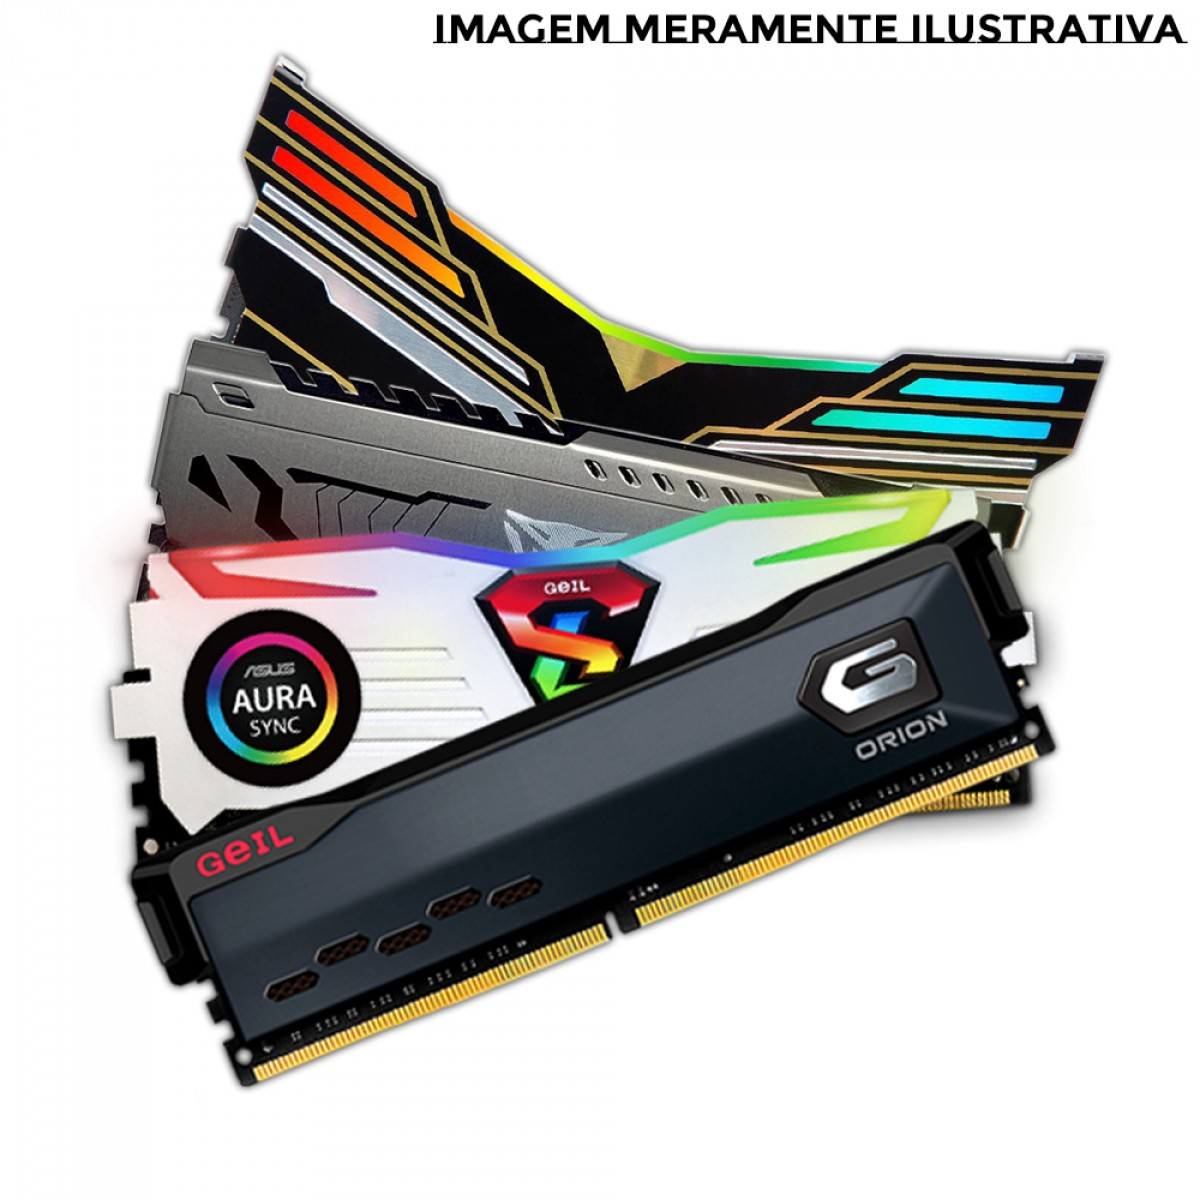 KIT UPGRADE, GIGABYTE B450M GAMING + AMD RYZEN 5 3400G +  16GB DDR4 (2X8GB) 3000MHZ